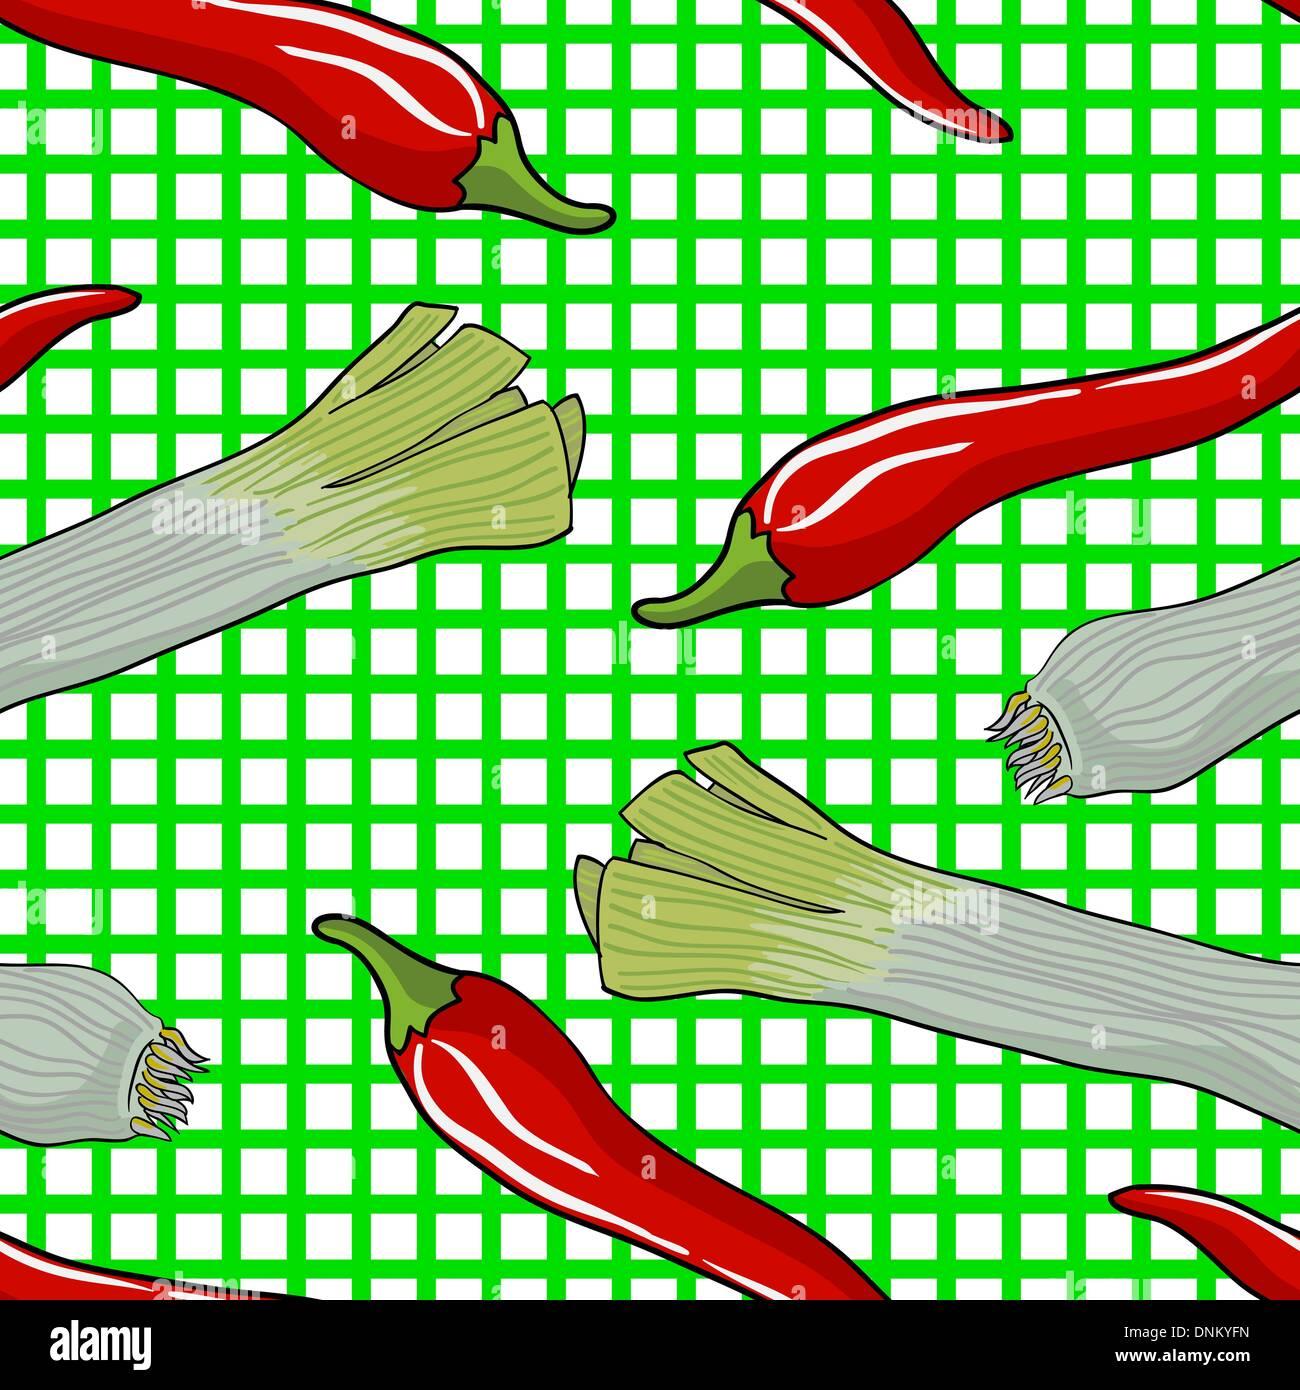 Seamless vegetable pattern leek and red pepper vector illustration - Stock Image